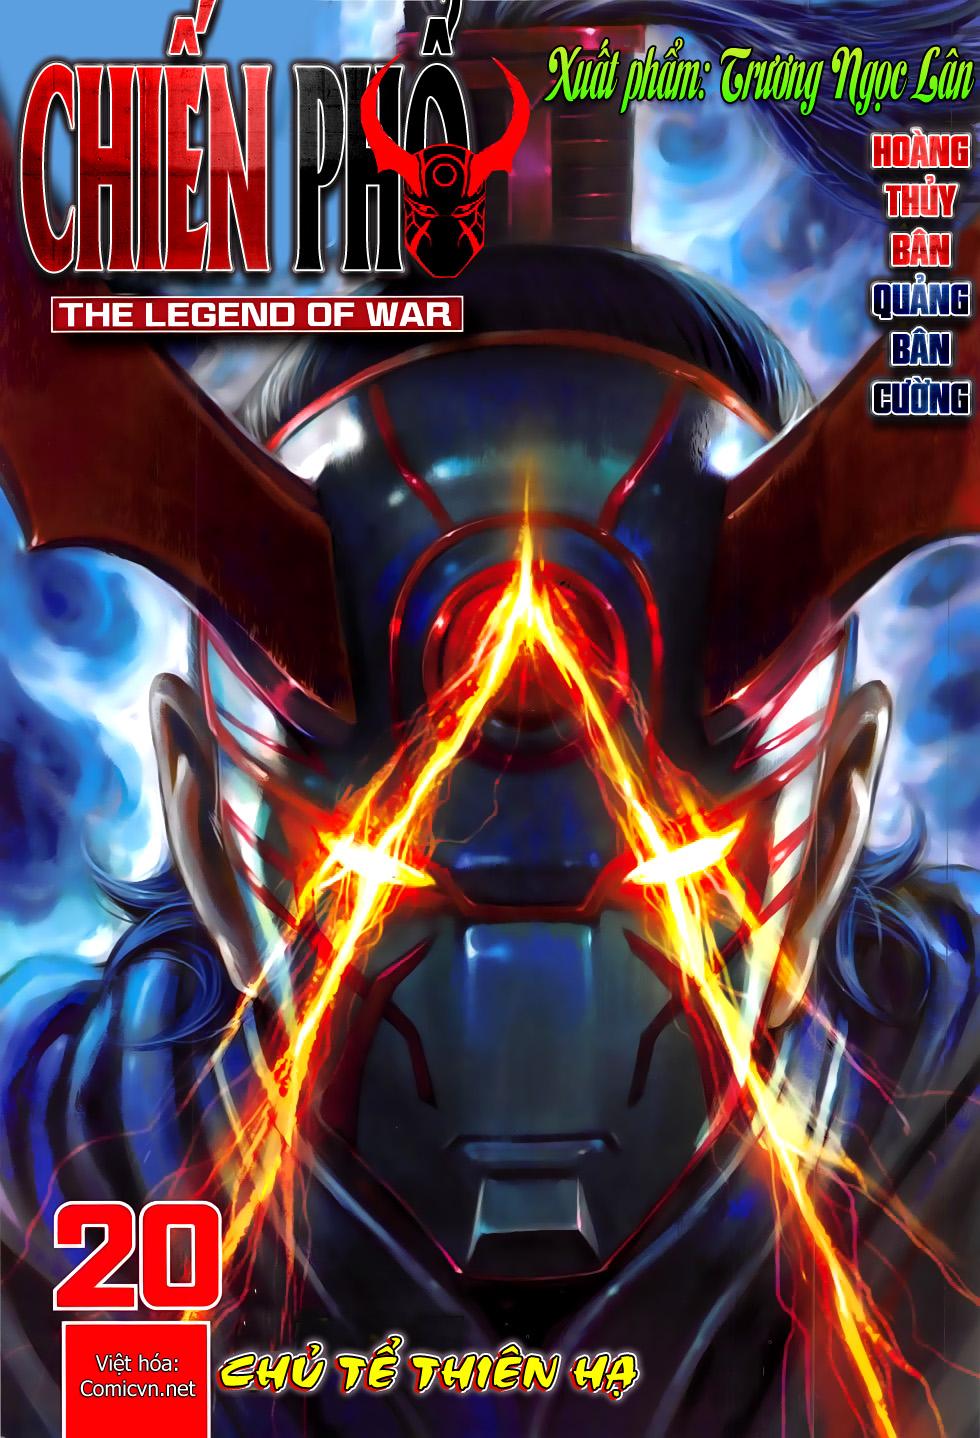 Chiến Phổ Chap 20 - Next Chap 21